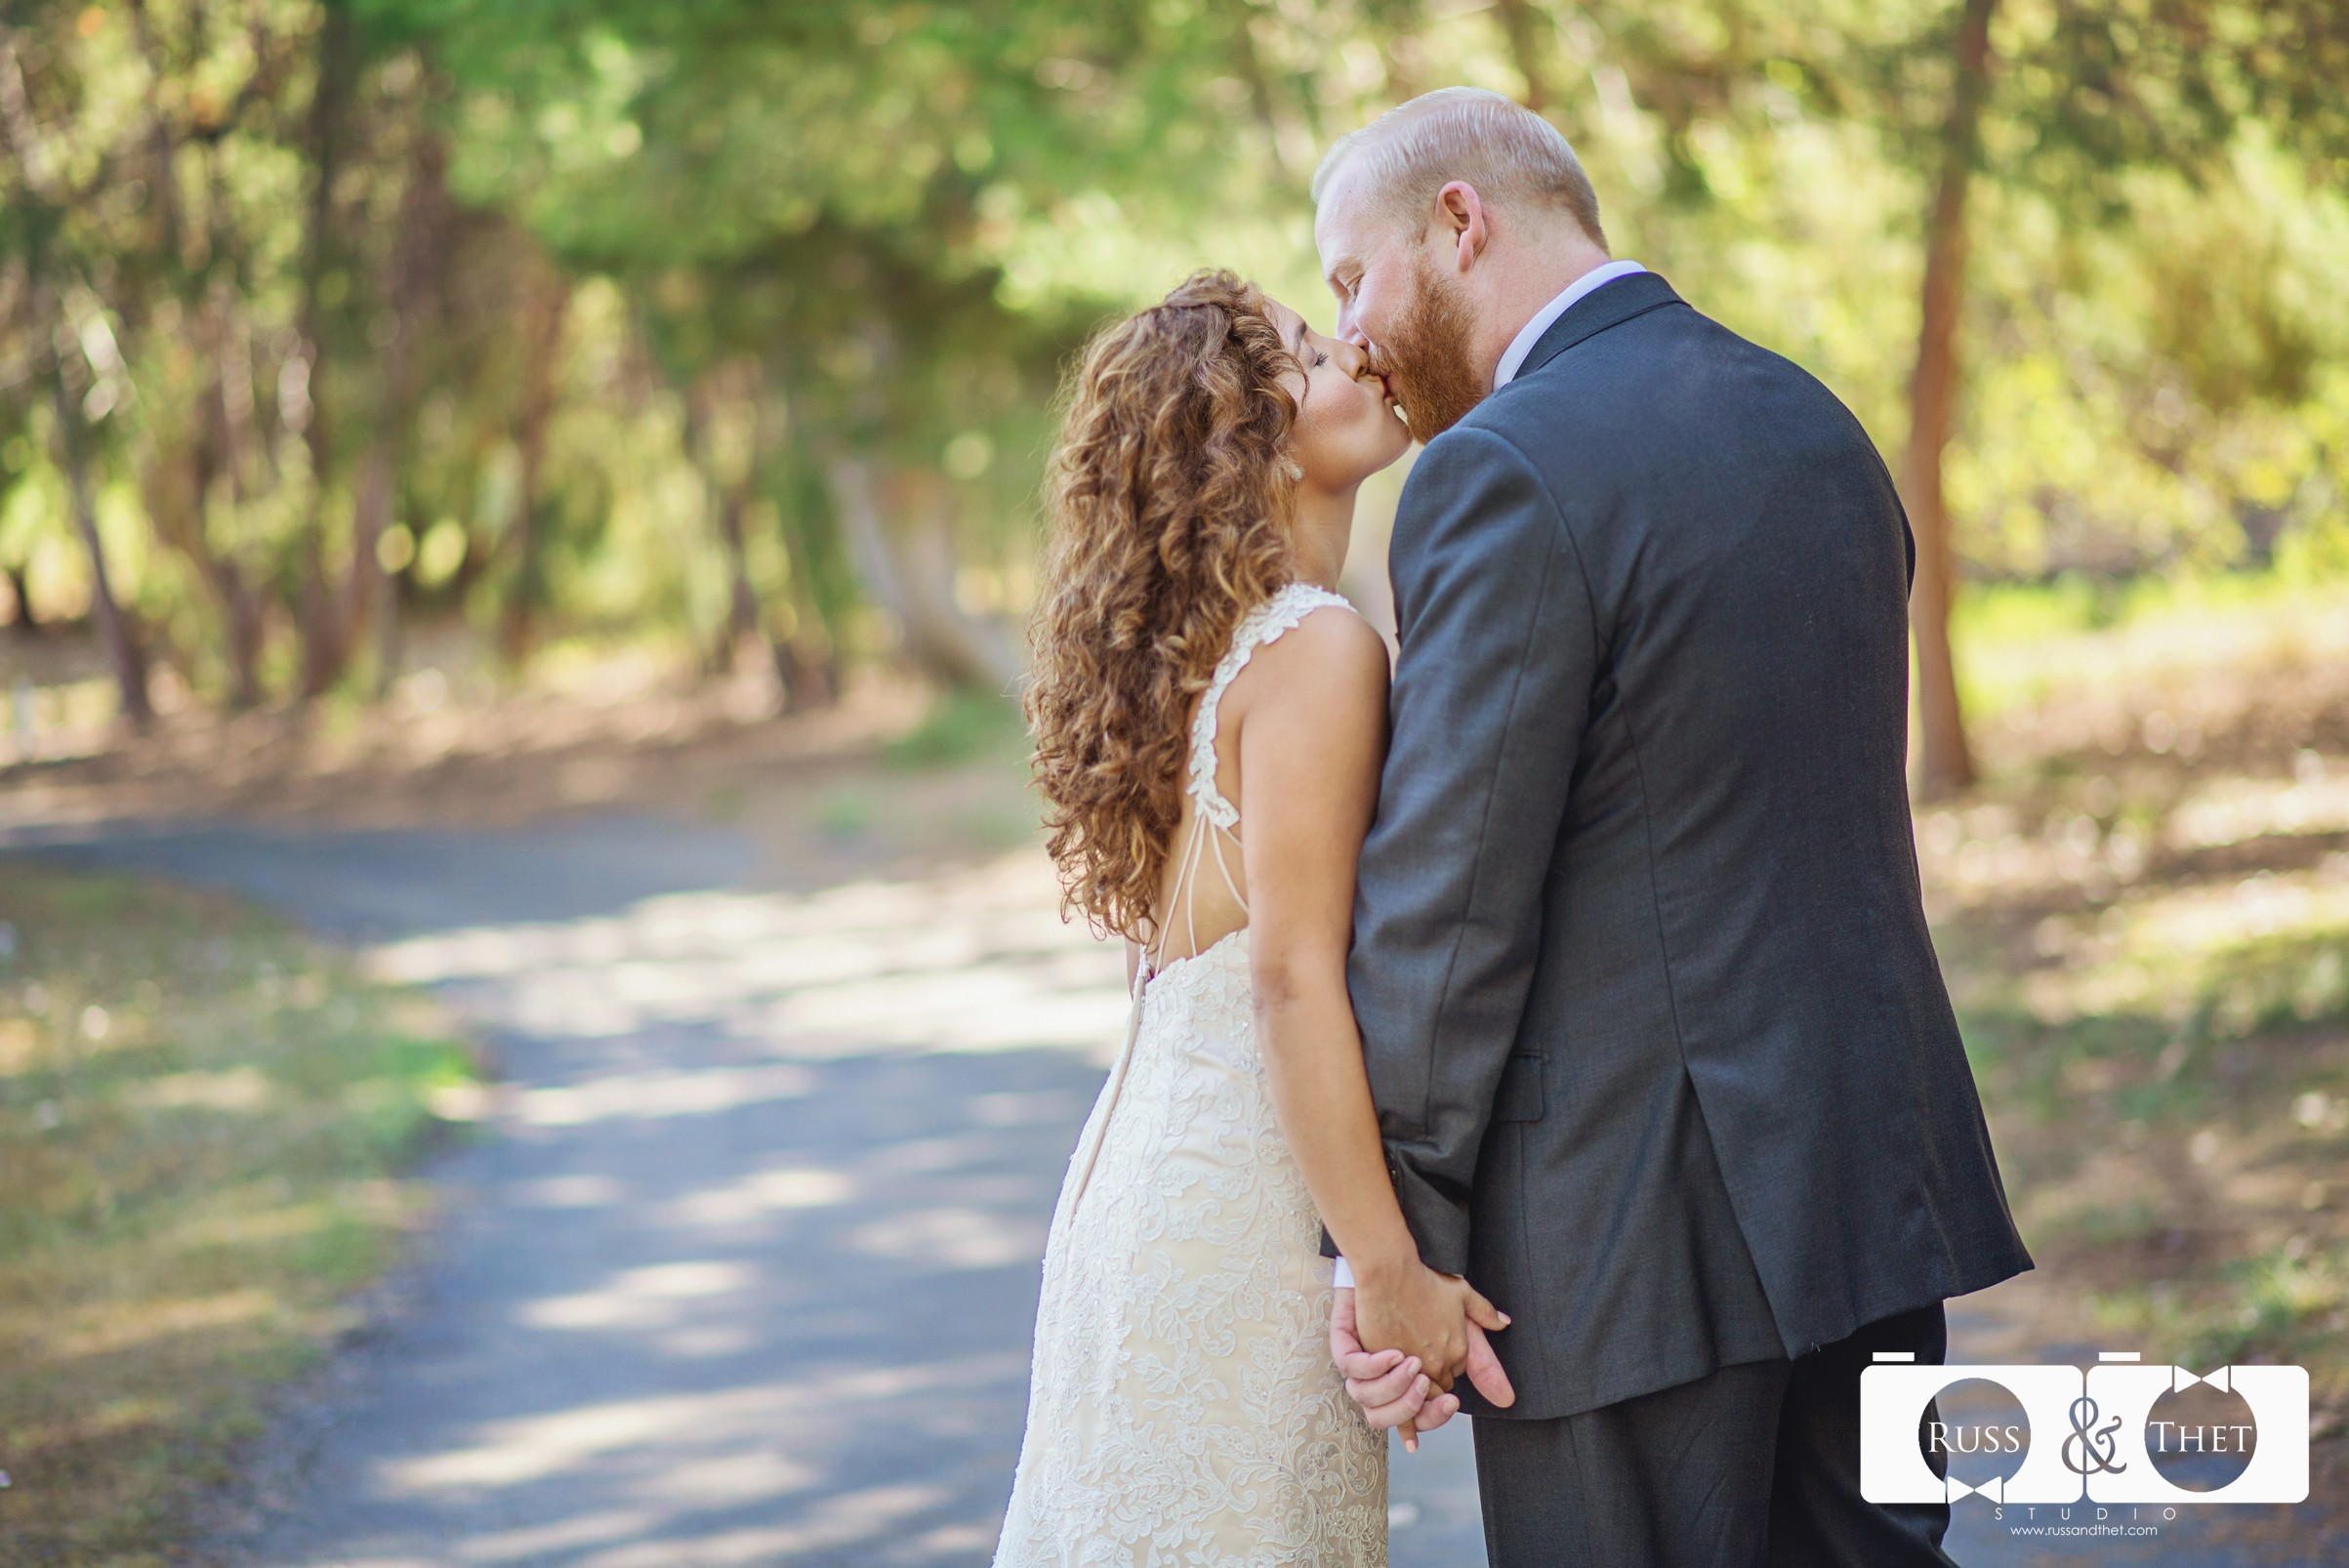 Andrew-and-Cristina-Yorba-Park-Wedding-Photographers (9).jpg